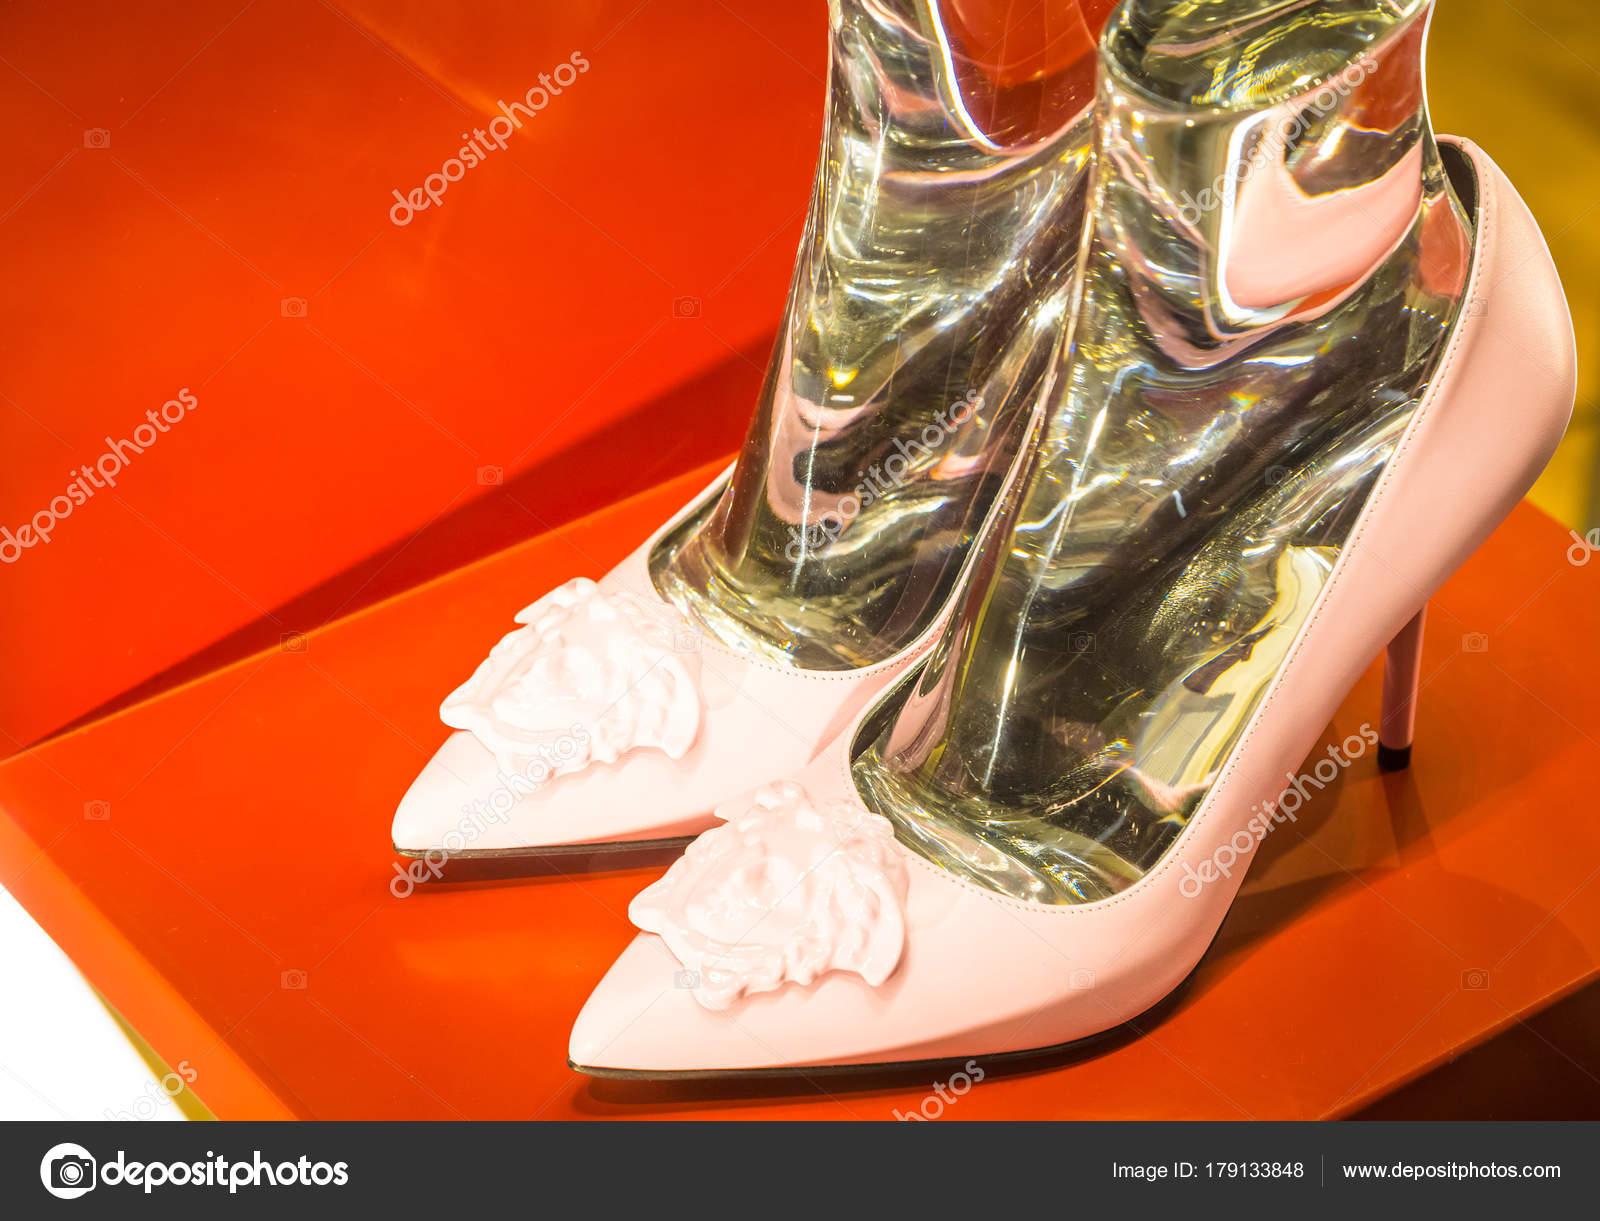 9ba0443aacb3 Παπούτσια μόδας στο Μιλάνο - Ιταλία — Φωτογραφία Αρχείου ...